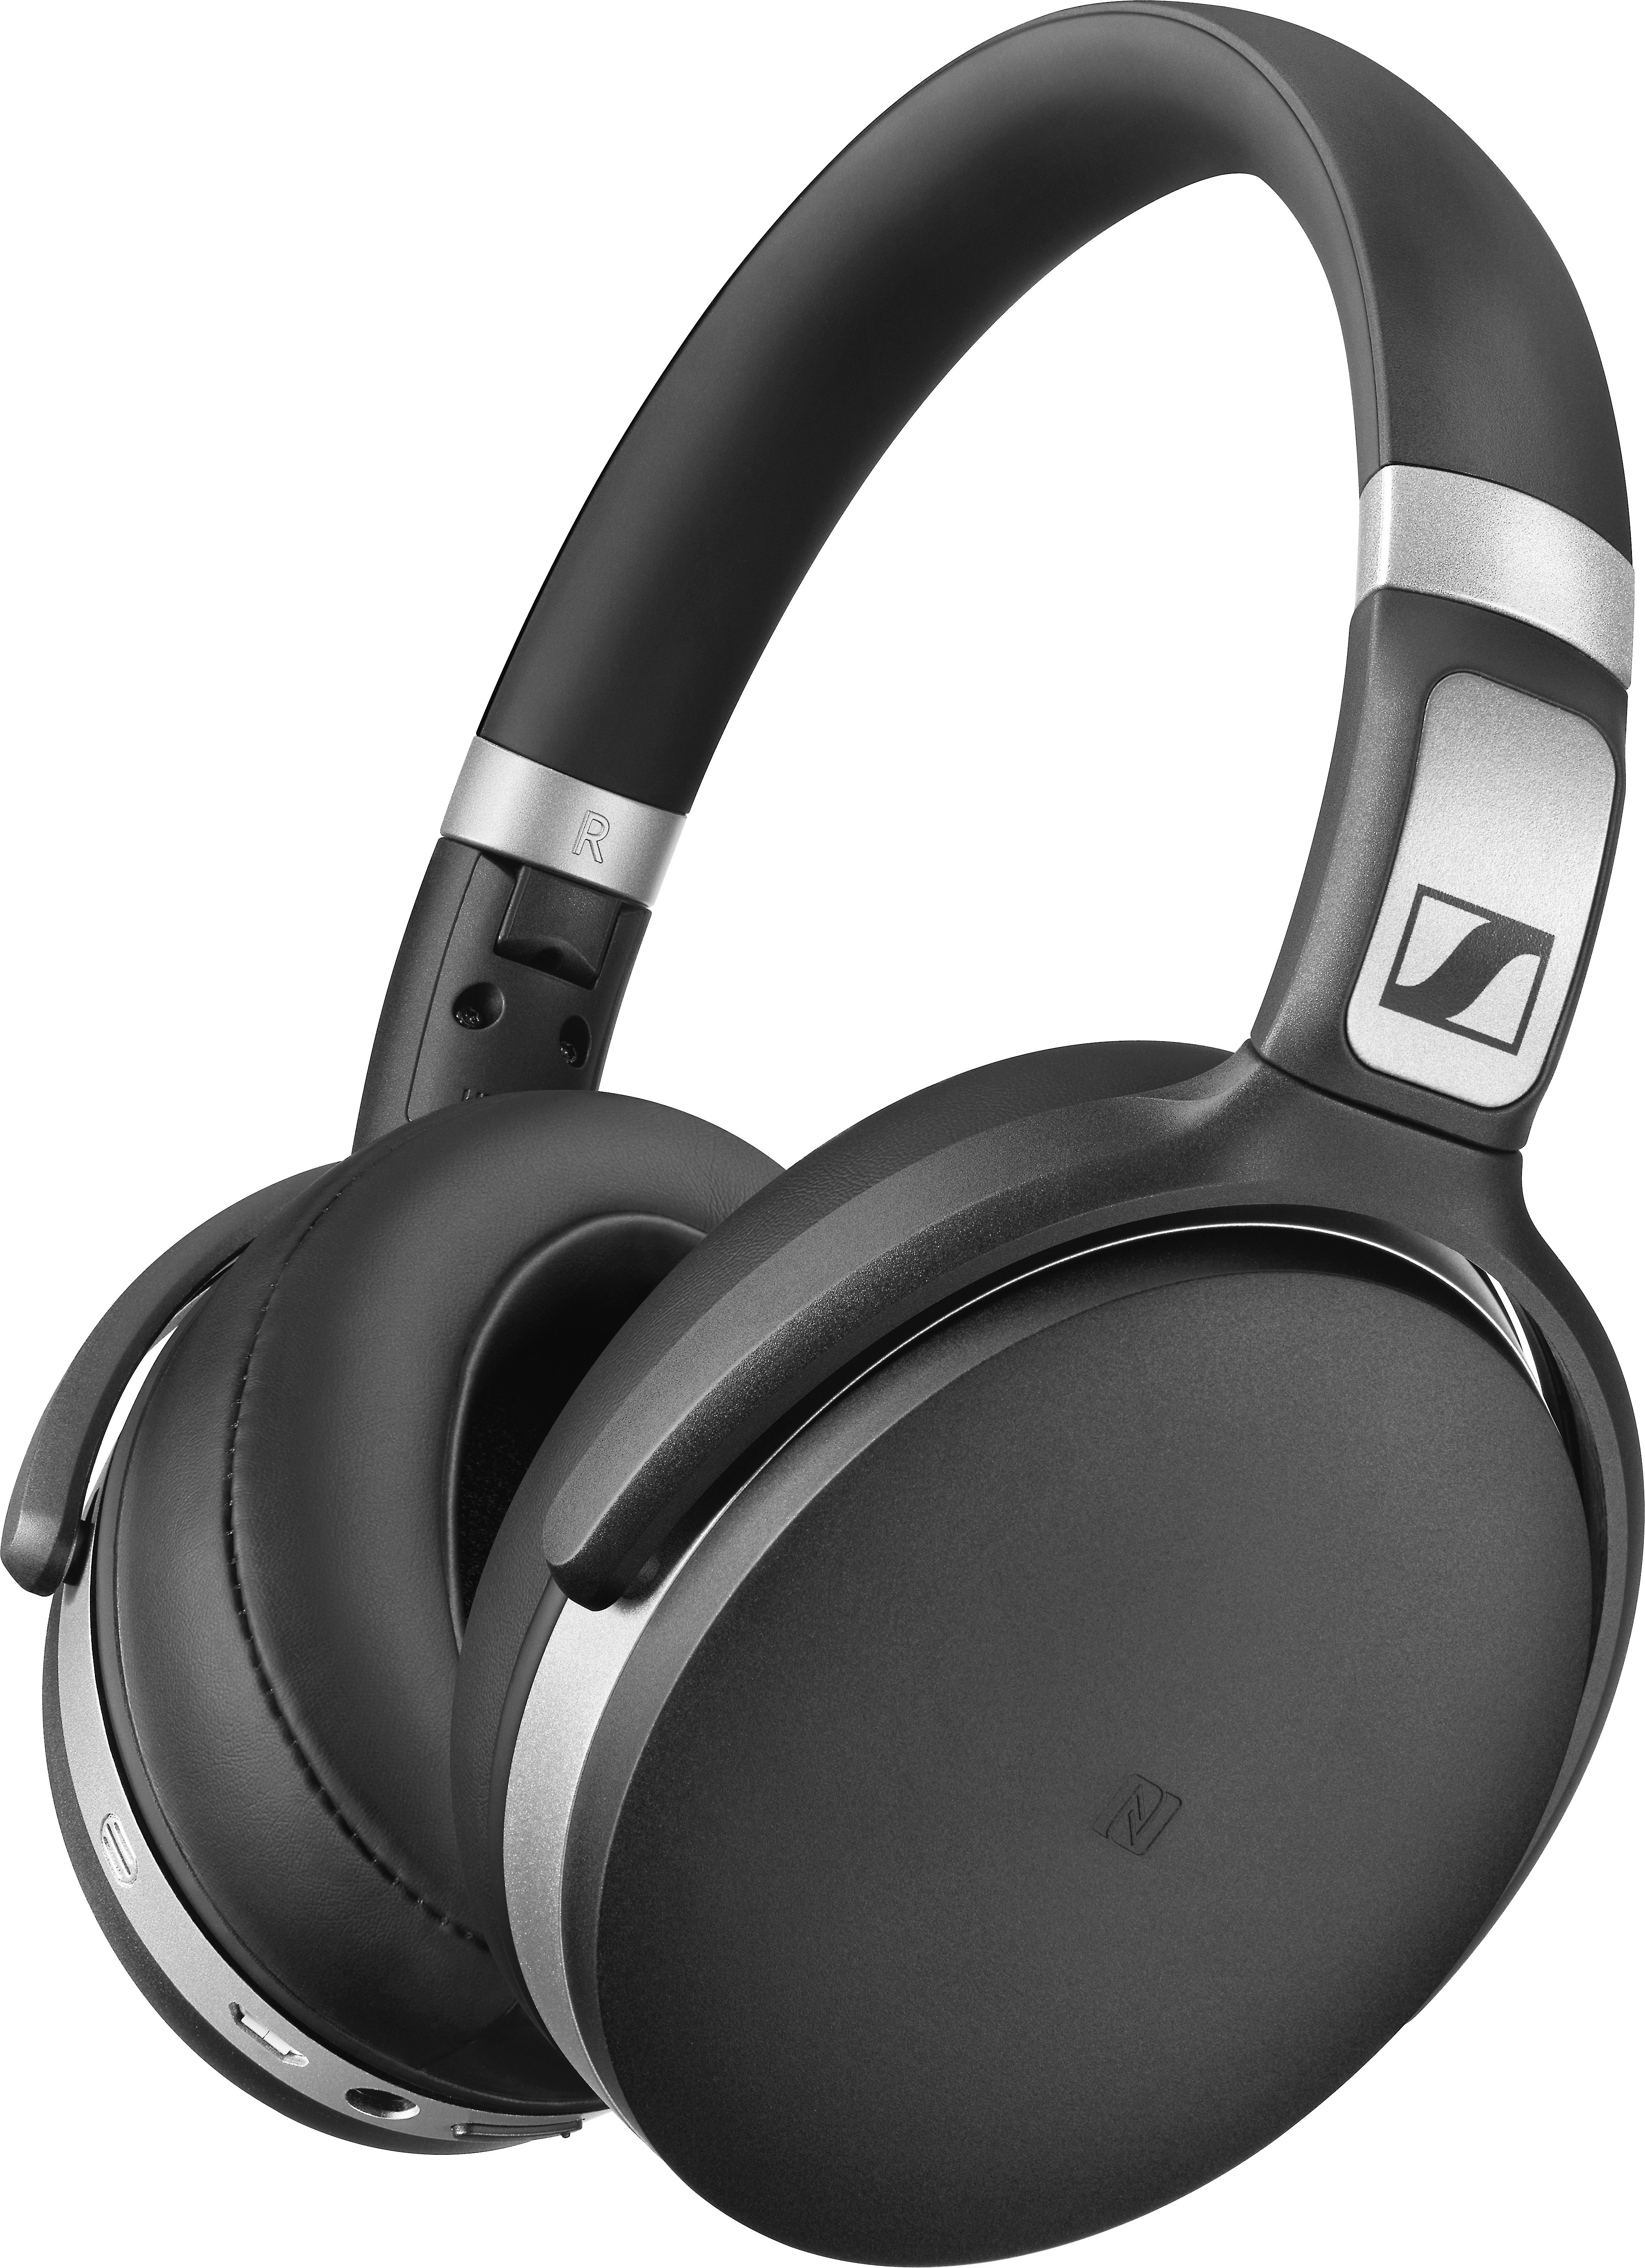 3a1e5eebdf8 Sennheiser HD 4.50 BTNC Over-ear wireless noise-canceling headphones at  Crutchfield.com